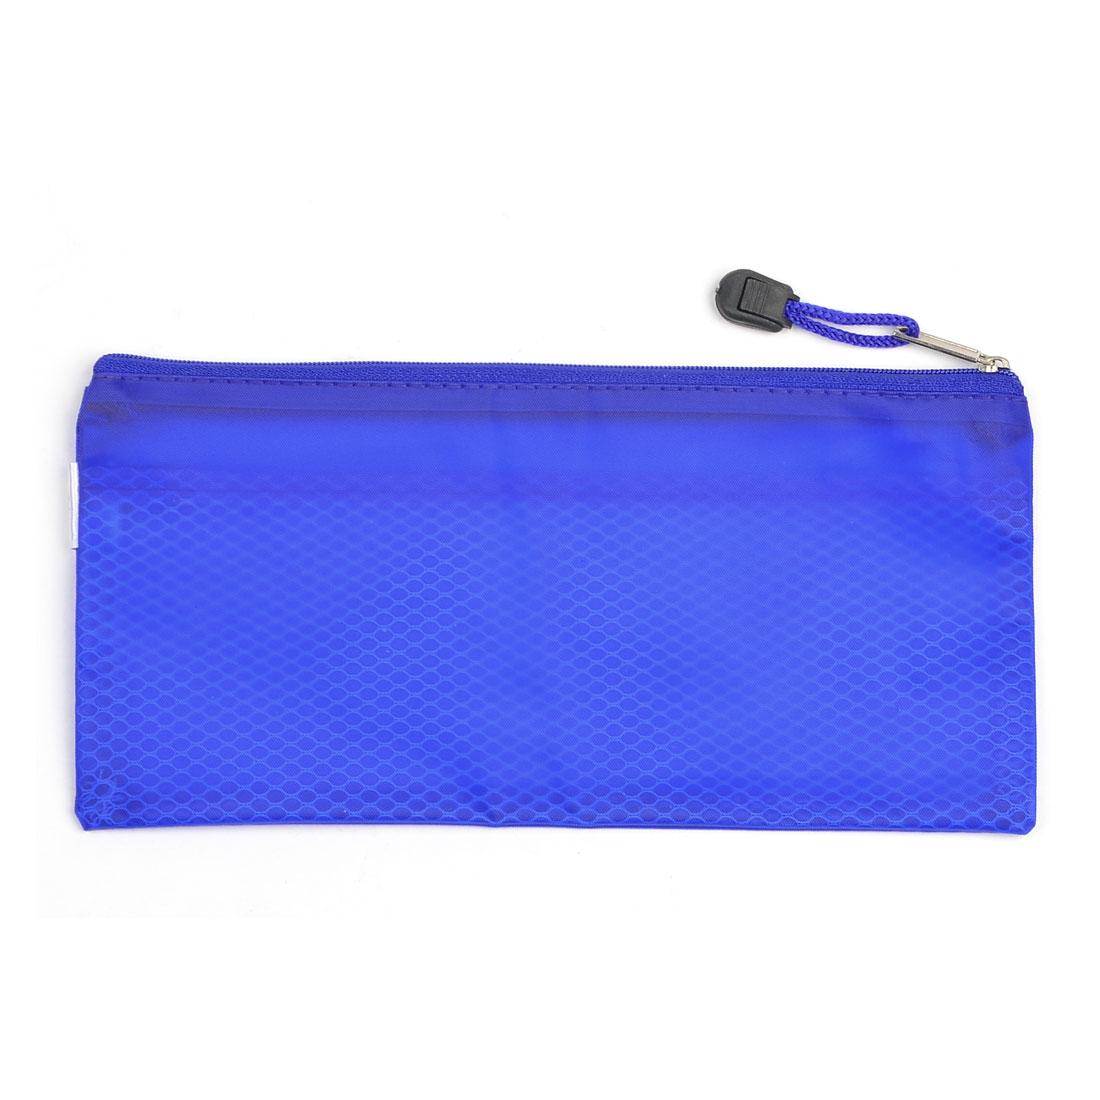 Netting Designed Zipped Closure Pen File Bags Pocket Orange